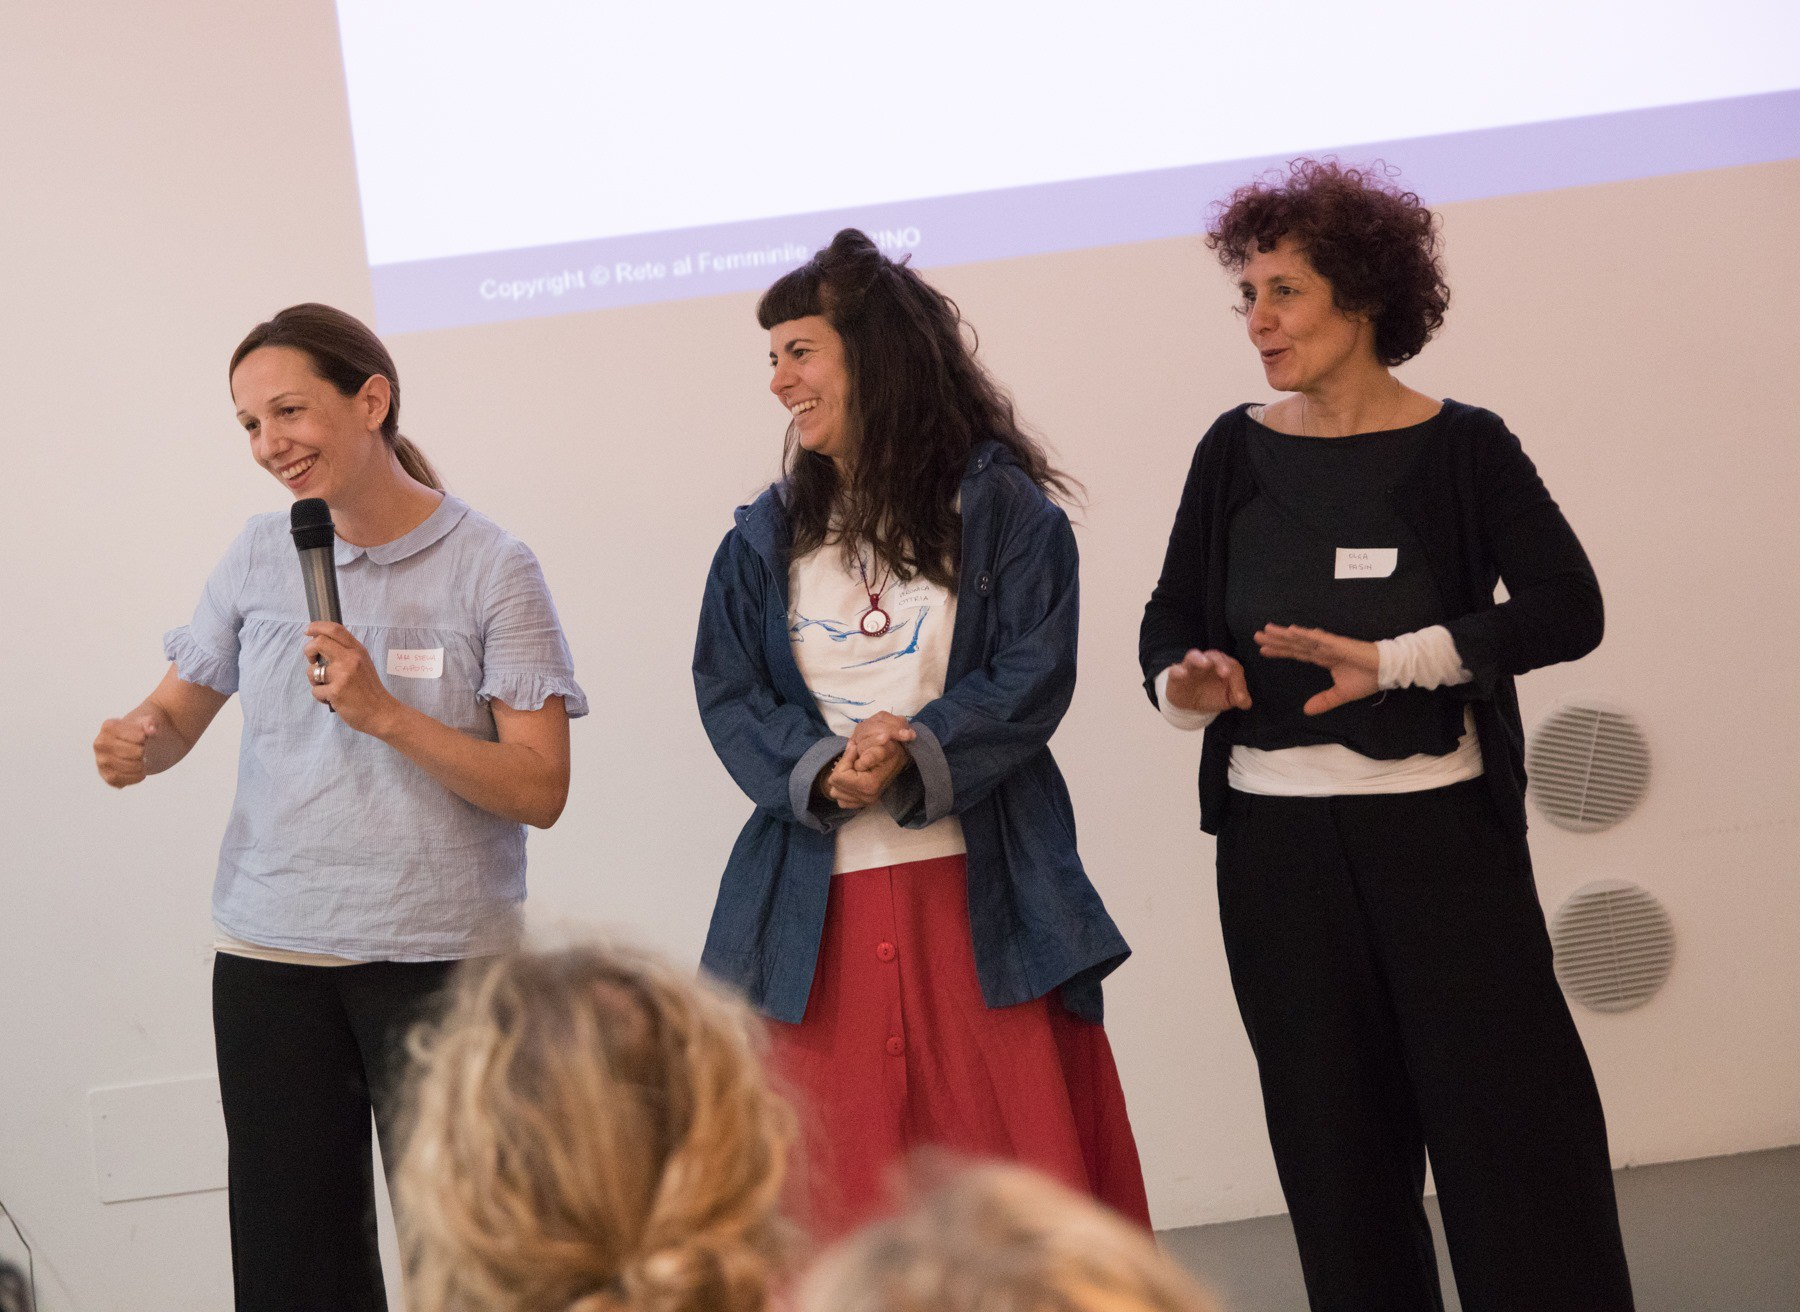 Rete al Femminile - Public speaking per il business